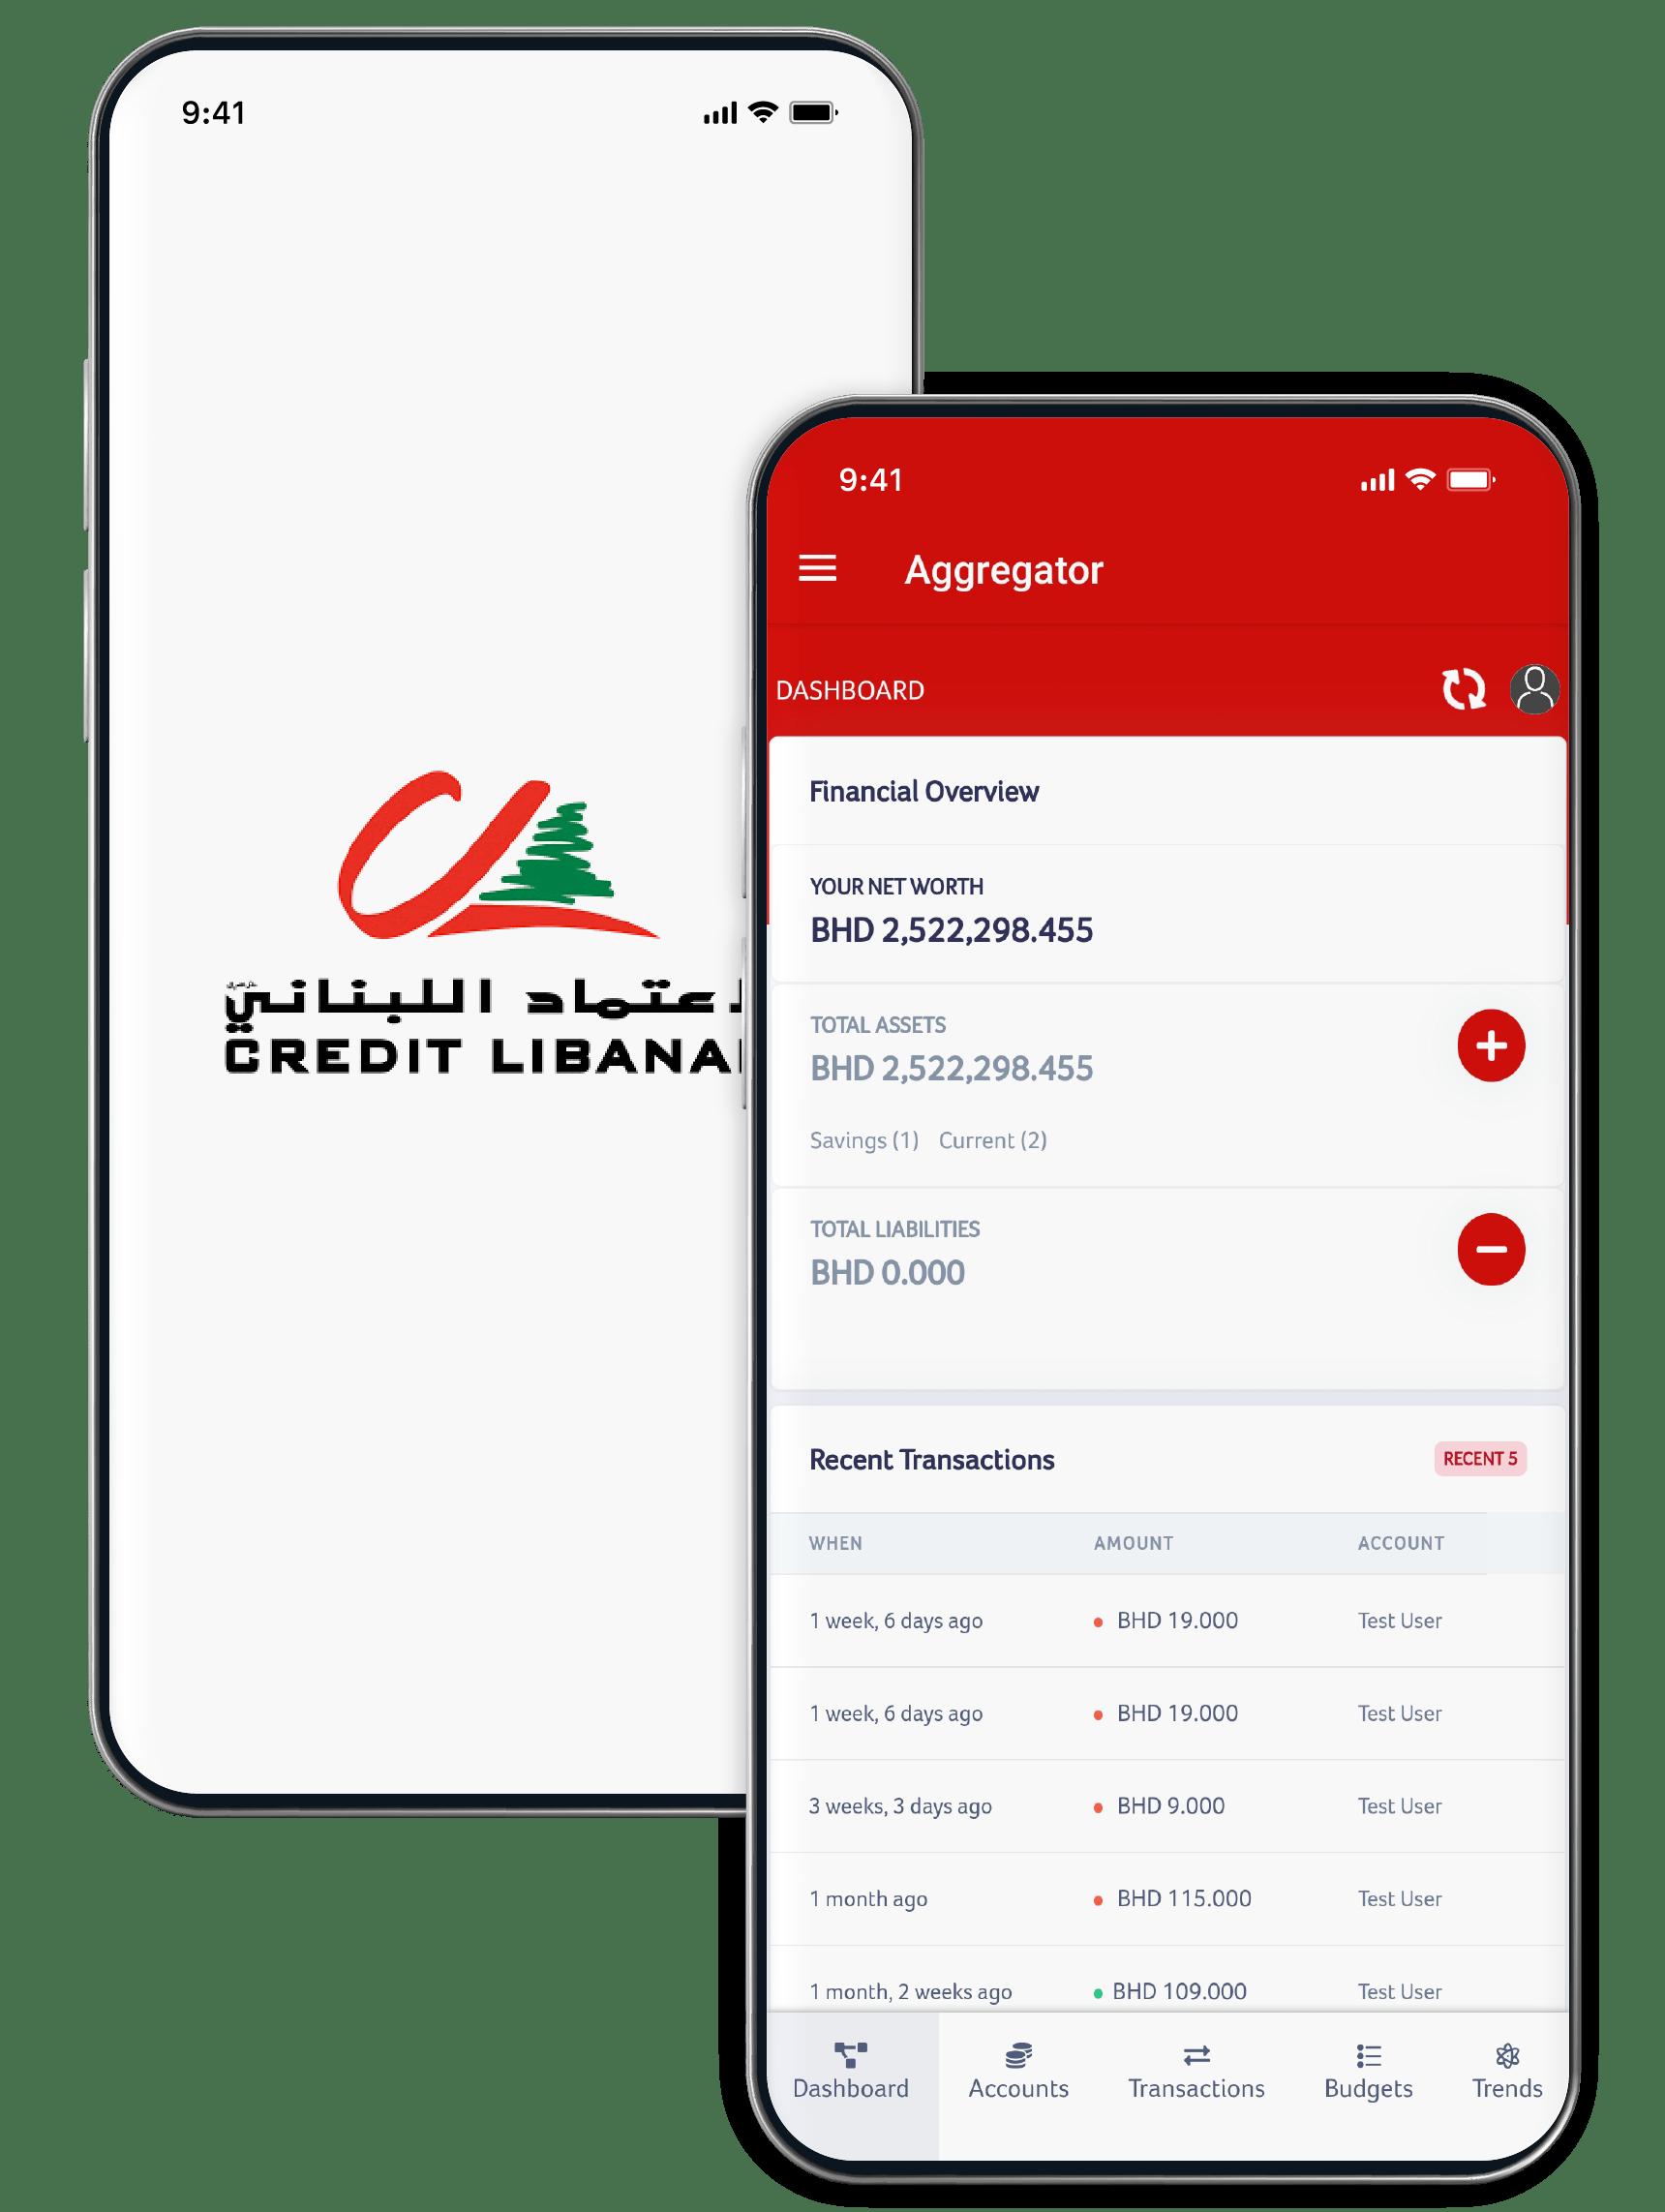 Account Aggregation - Credit Libanais